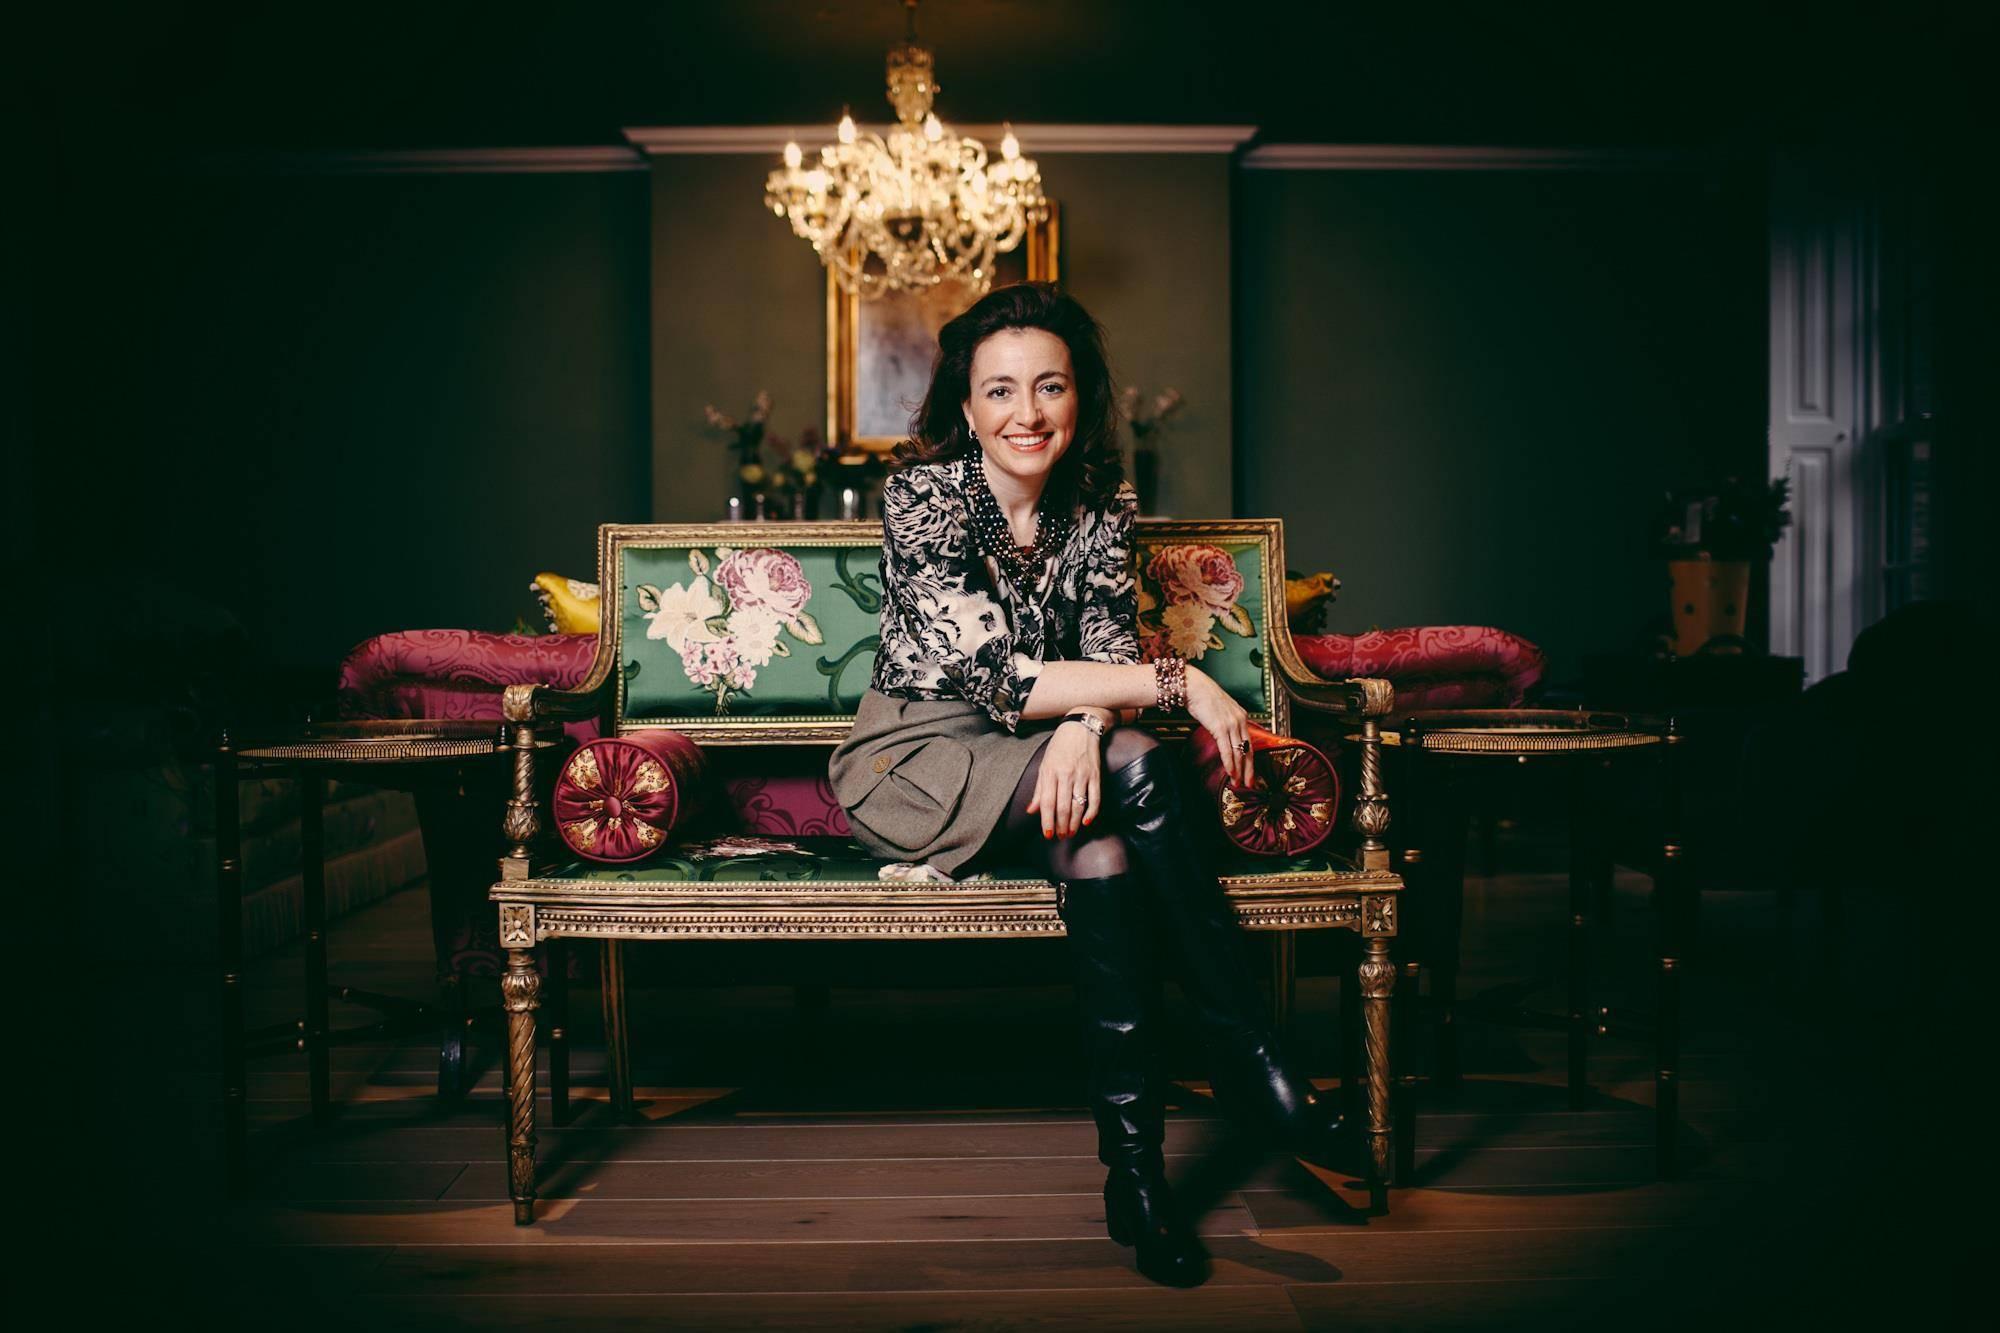 Meet Rachel Bates Interior Designer With Passion For